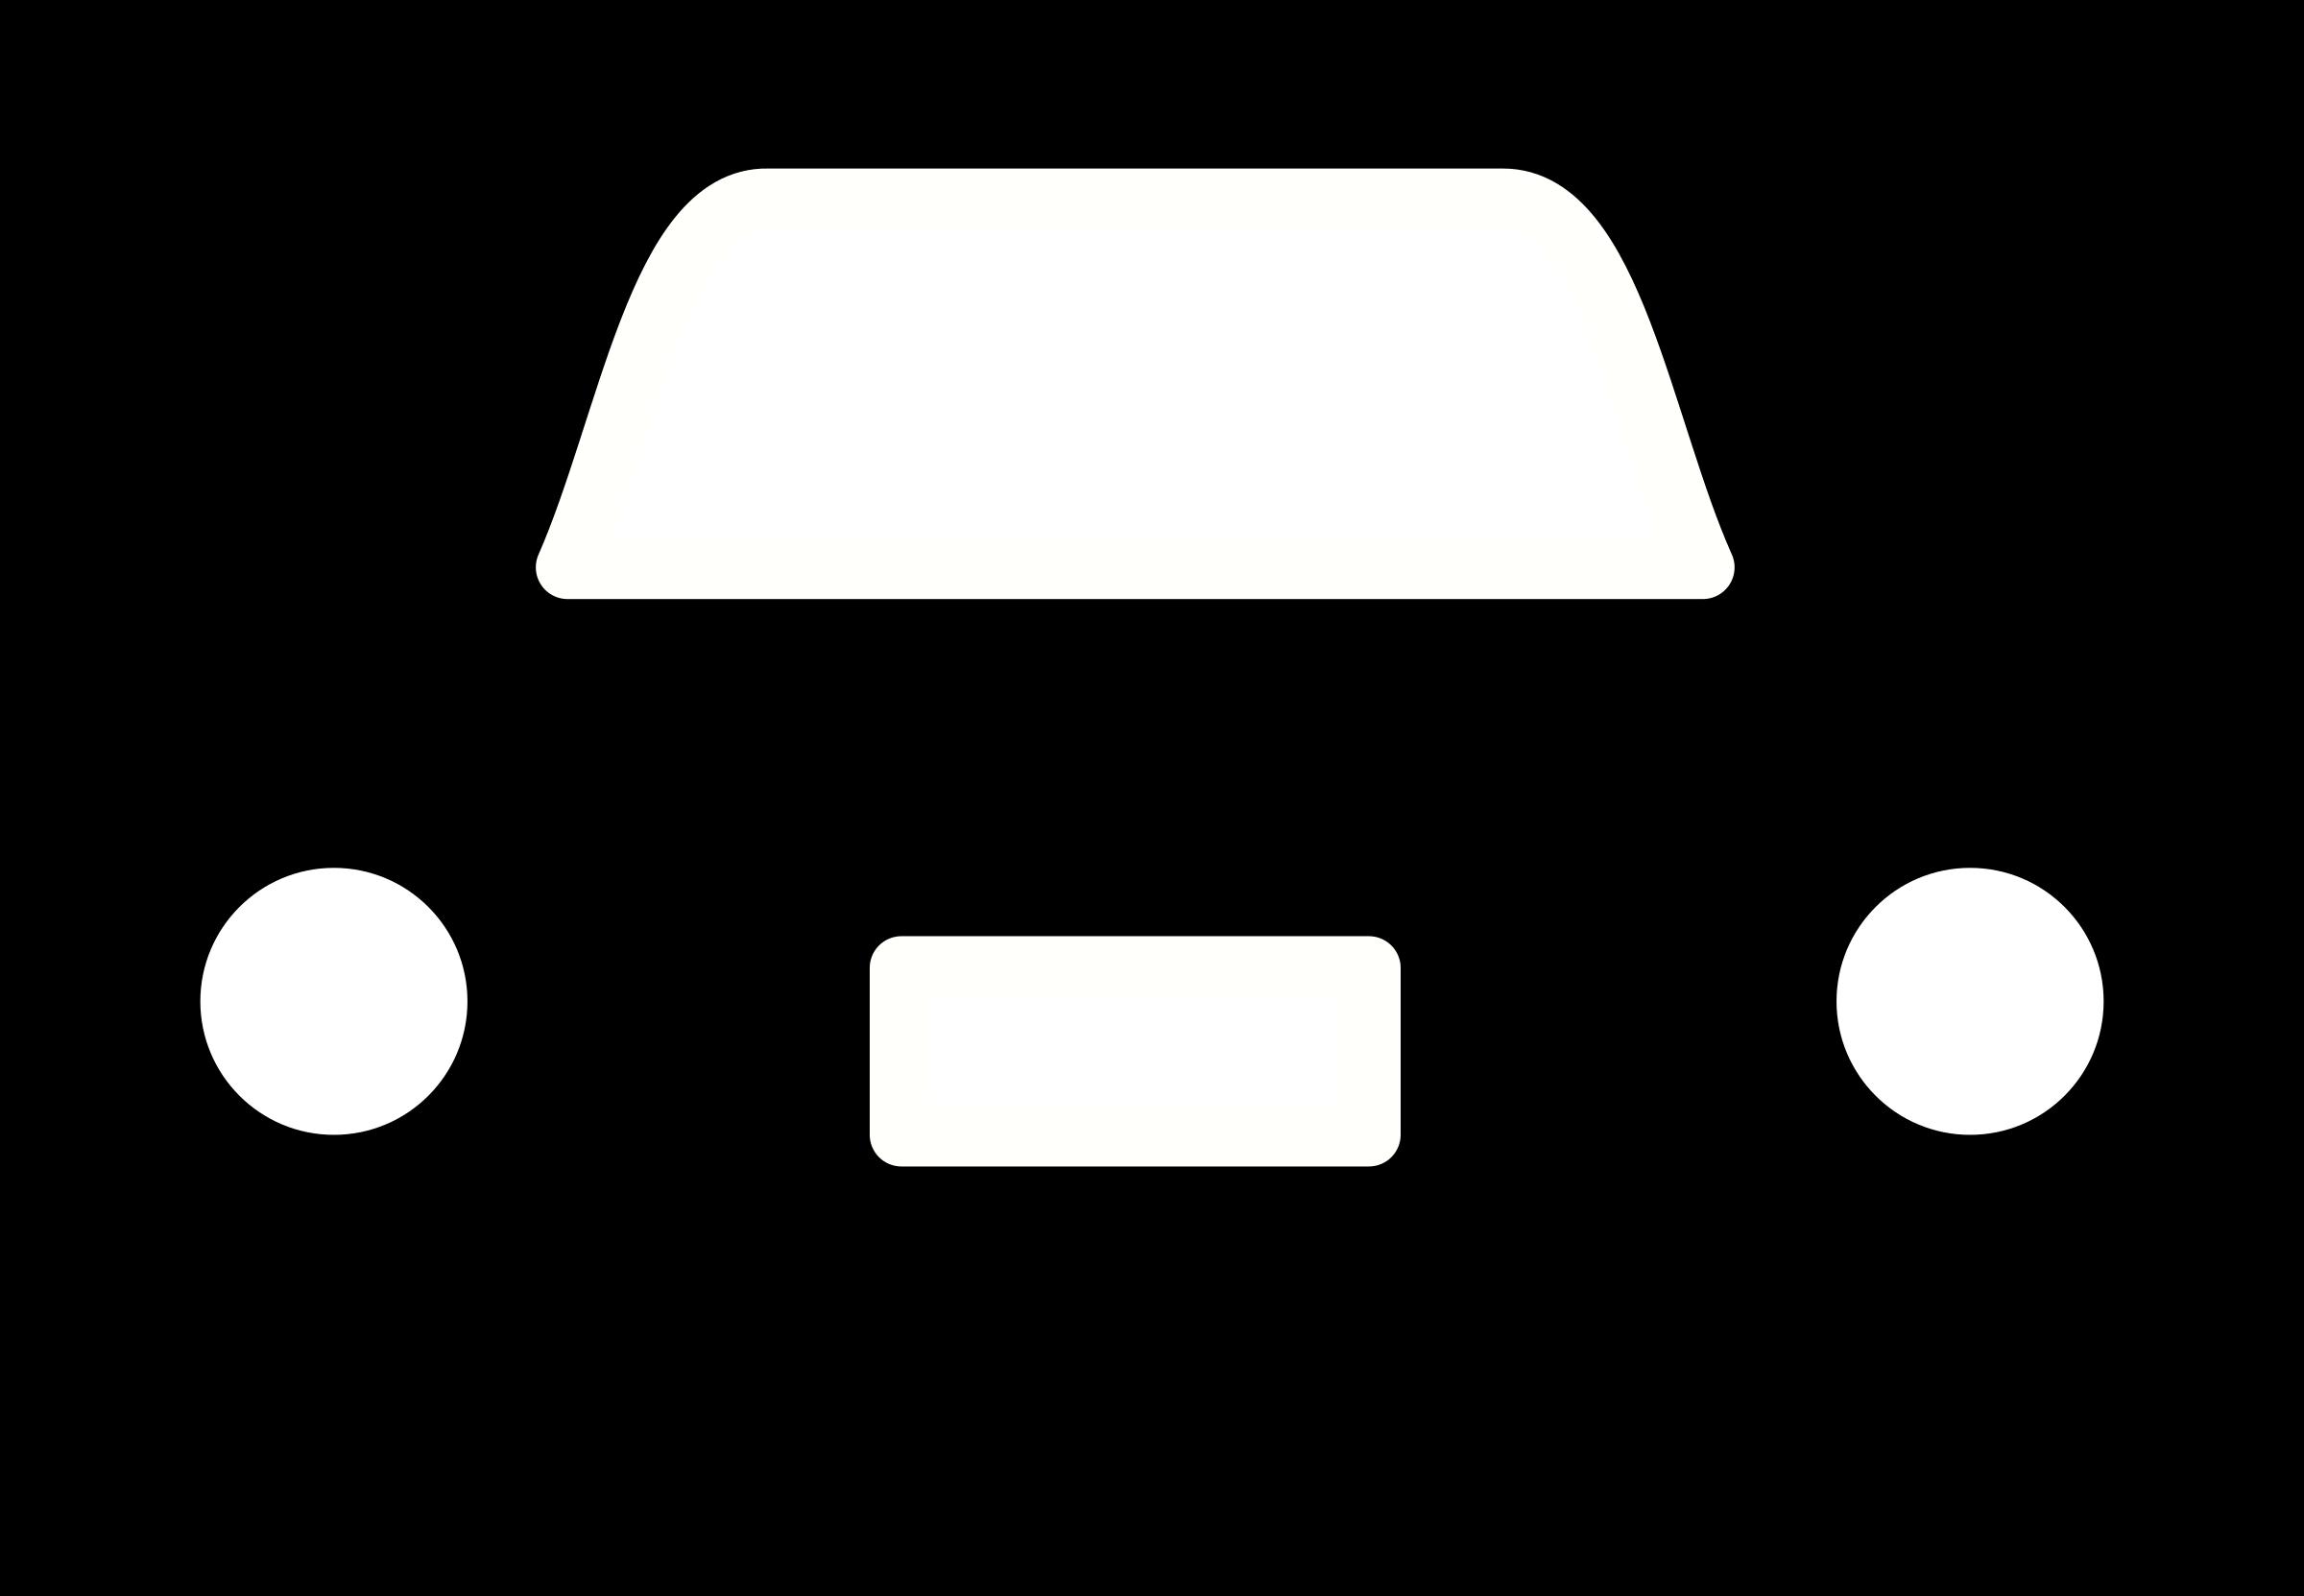 Clipart cars face. Car pictogram